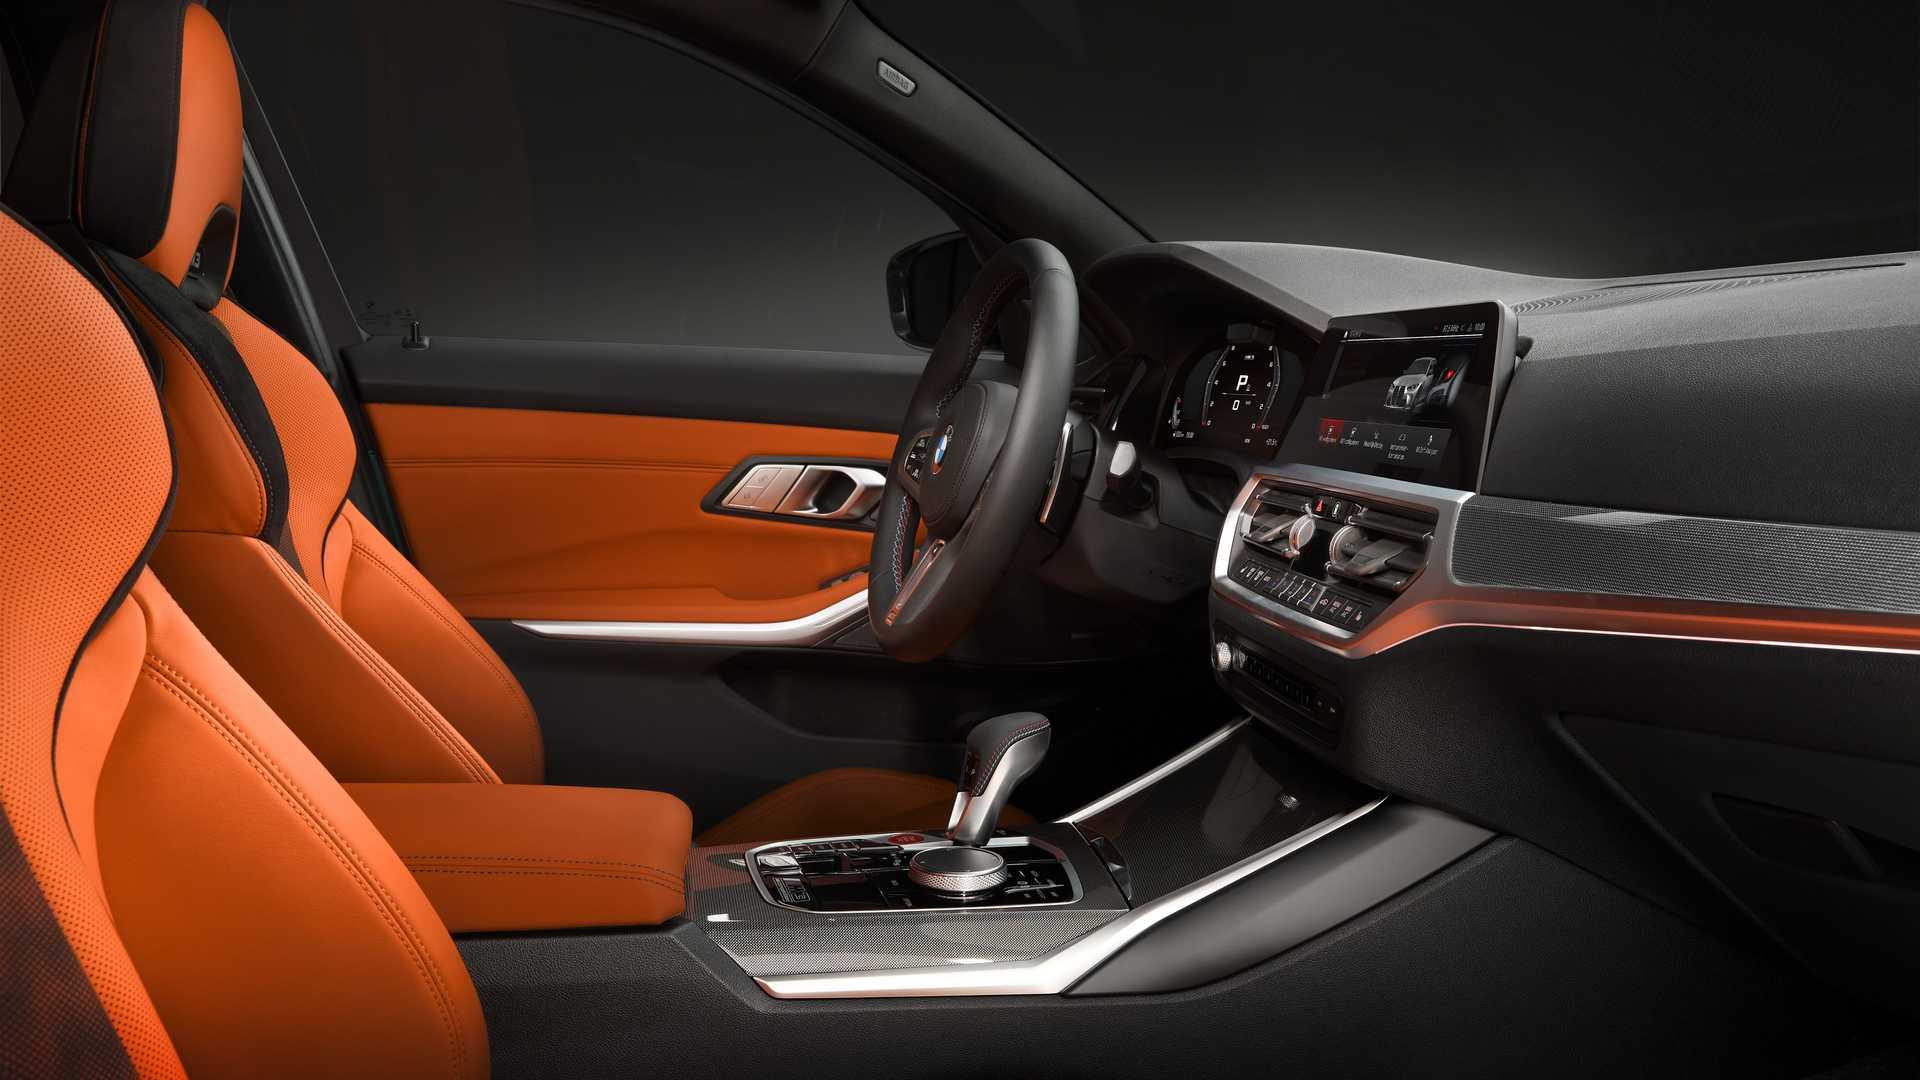 2021-bmw-m3-interior (2)